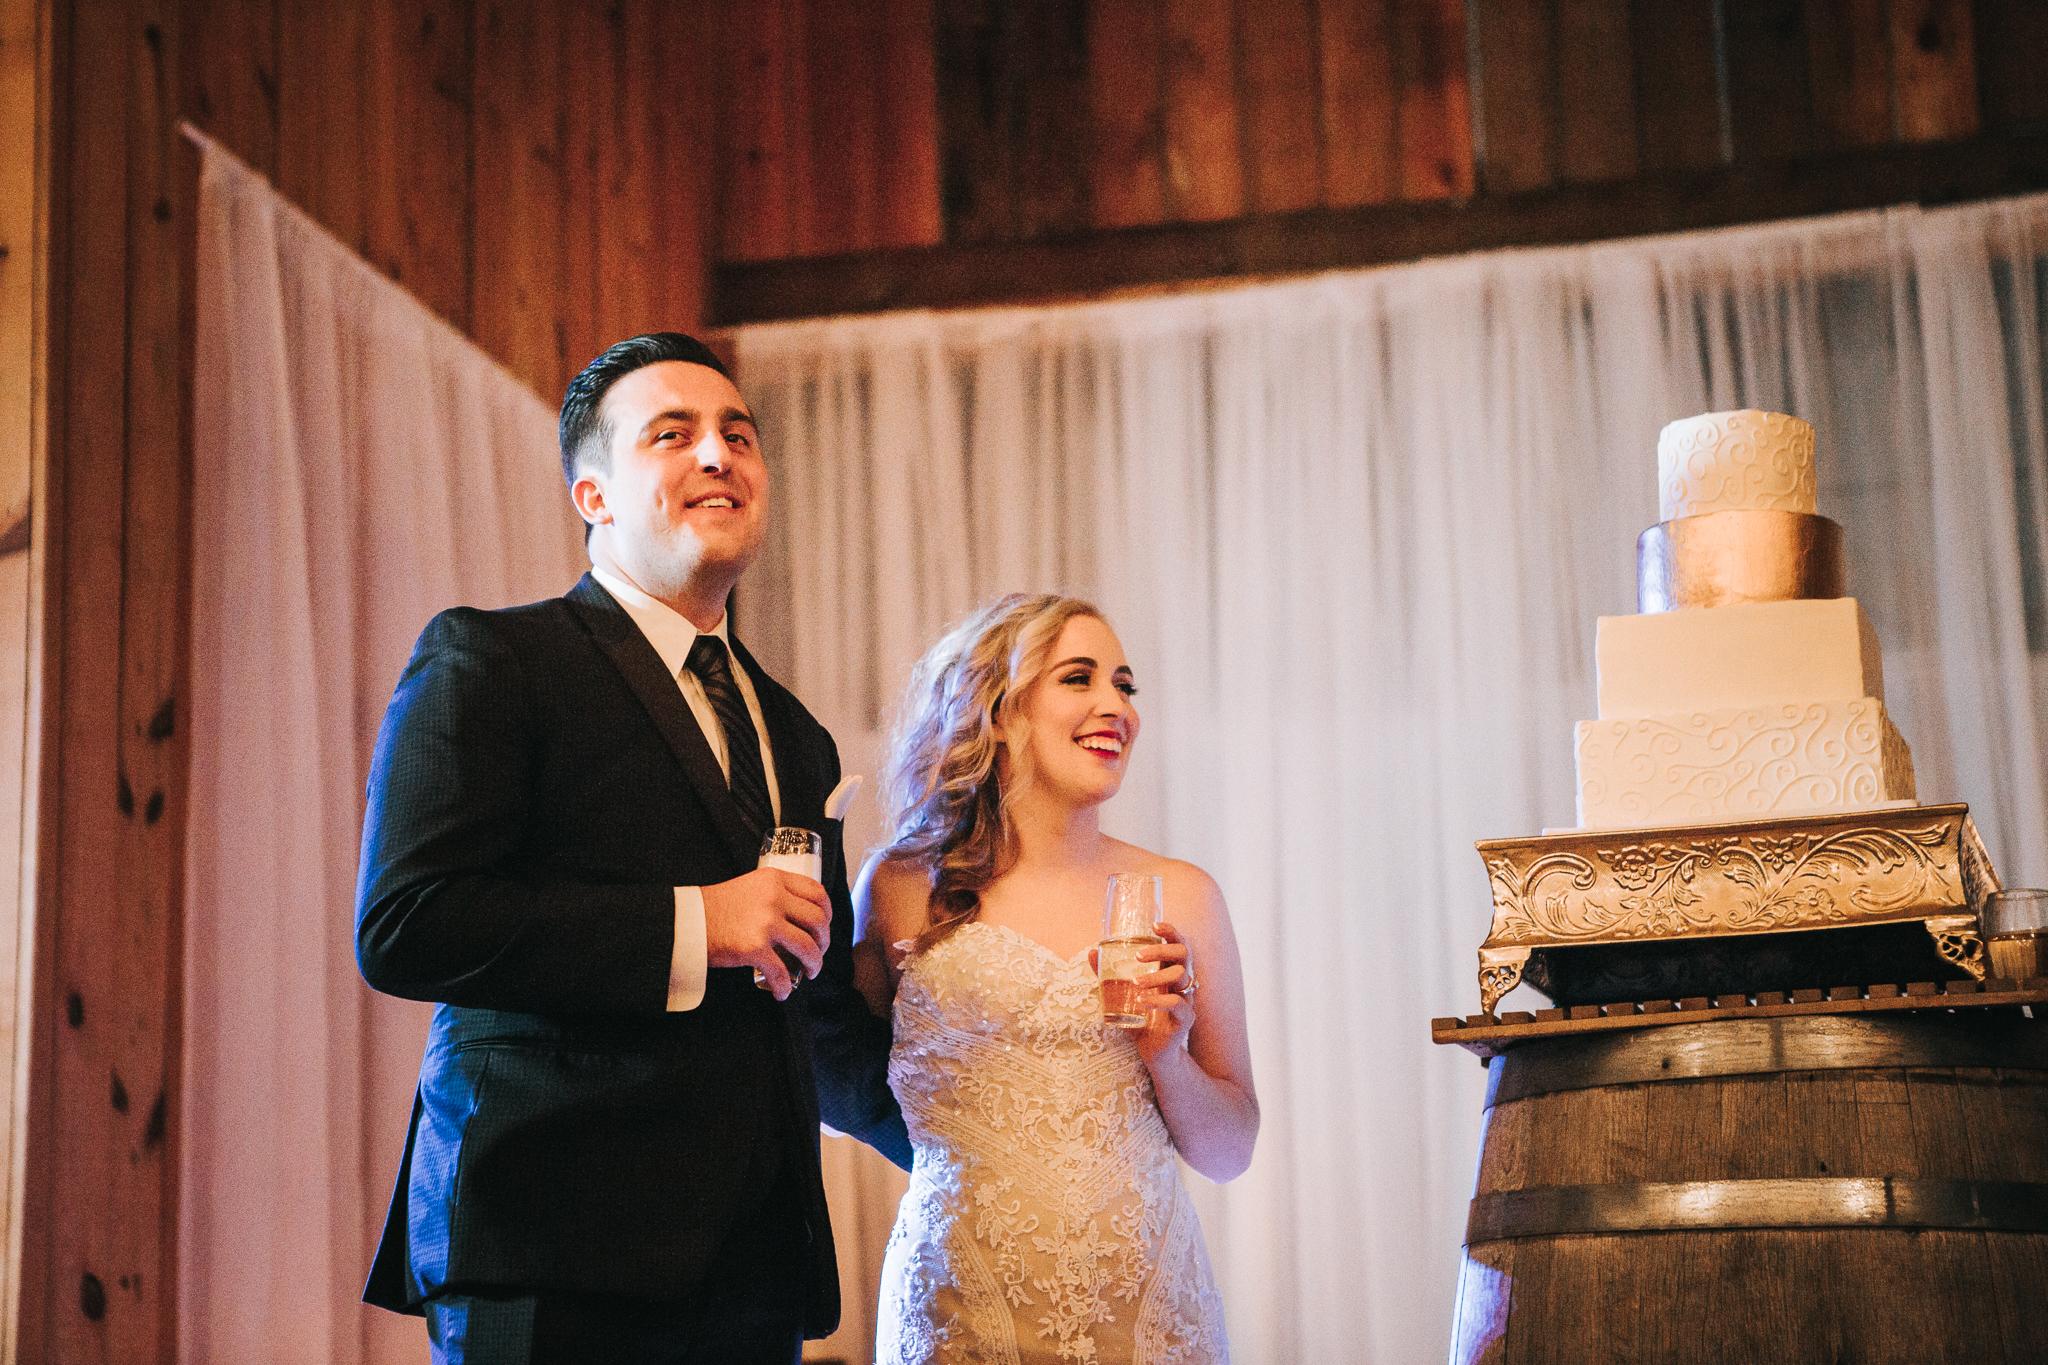 0156 Ariana Jordan Photo - Cameron & Lauren's Wedding at Talon Winery  9498.jpg